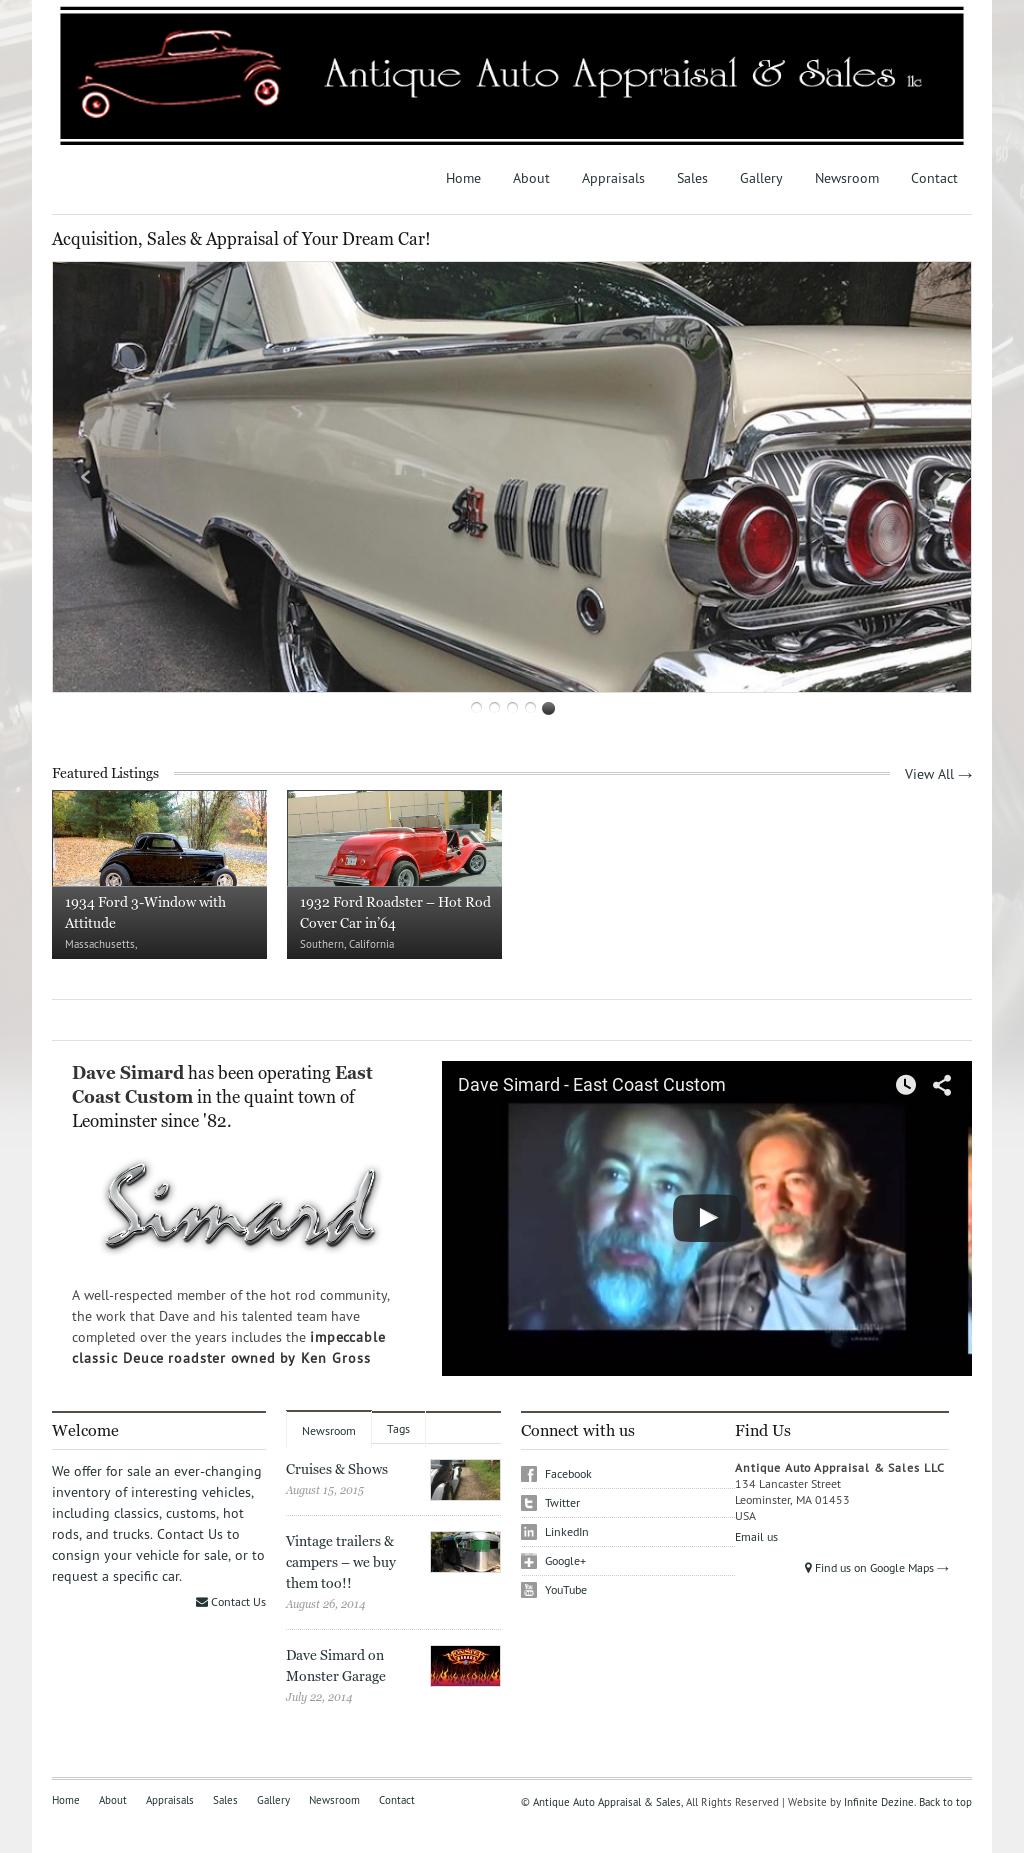 Antique Auto Appraisal & Sales Competitors, Revenue and Employees ...